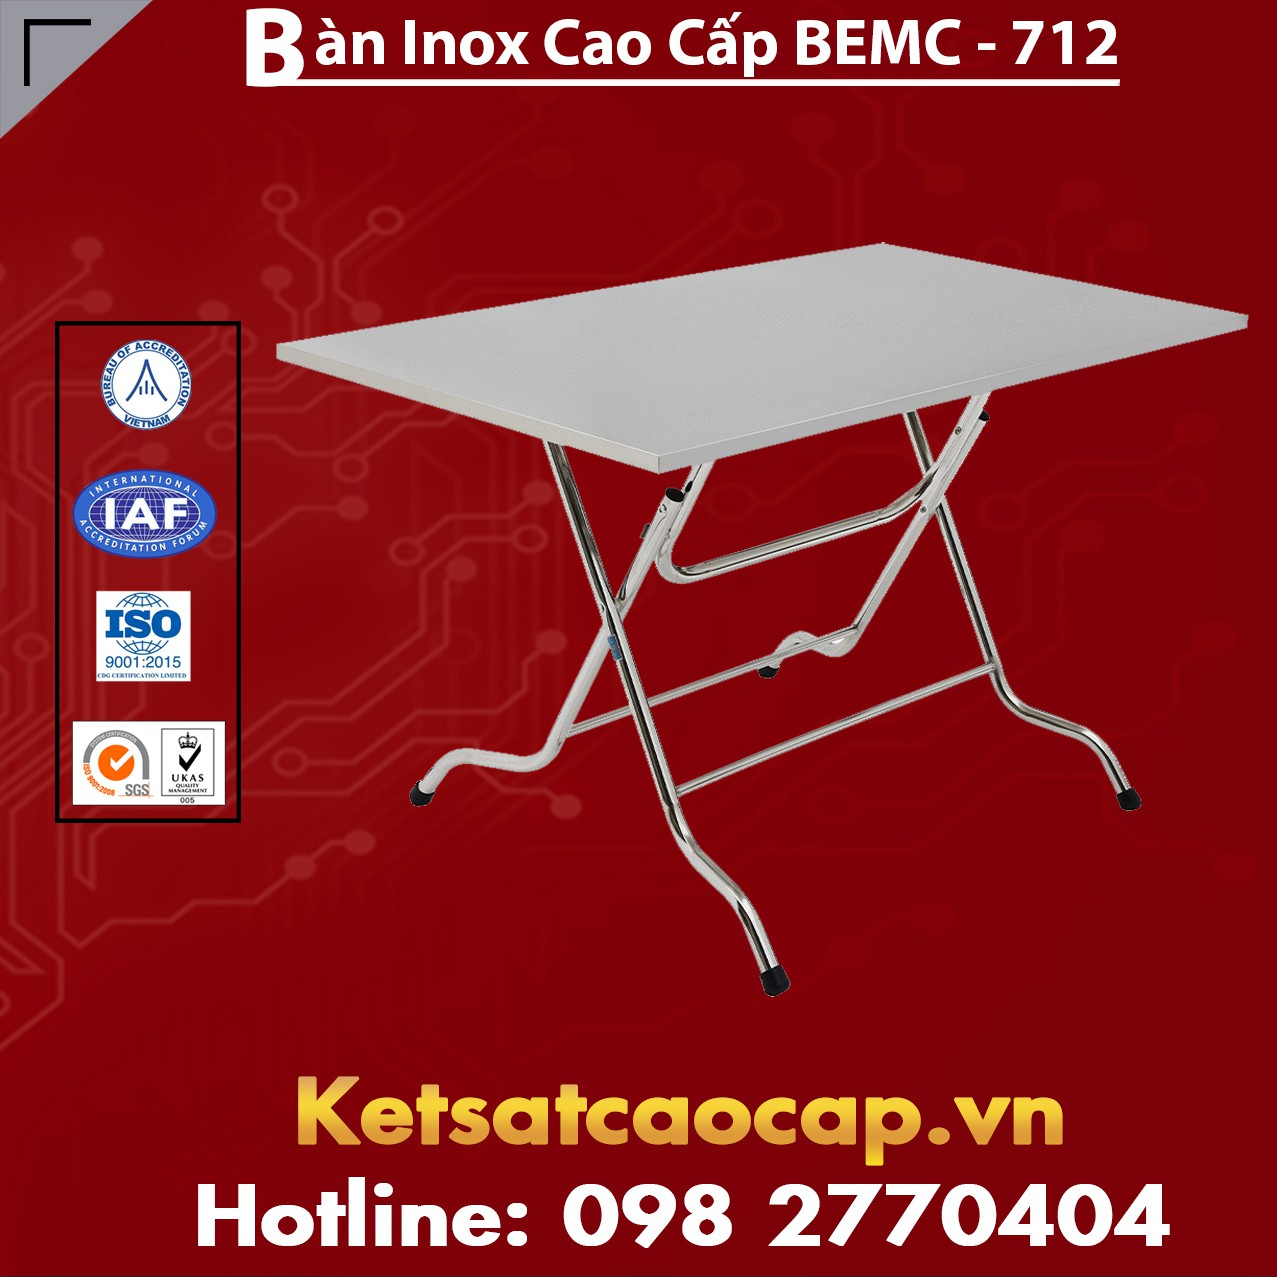 Bàn Inox Cao Cấp BEMC - 712